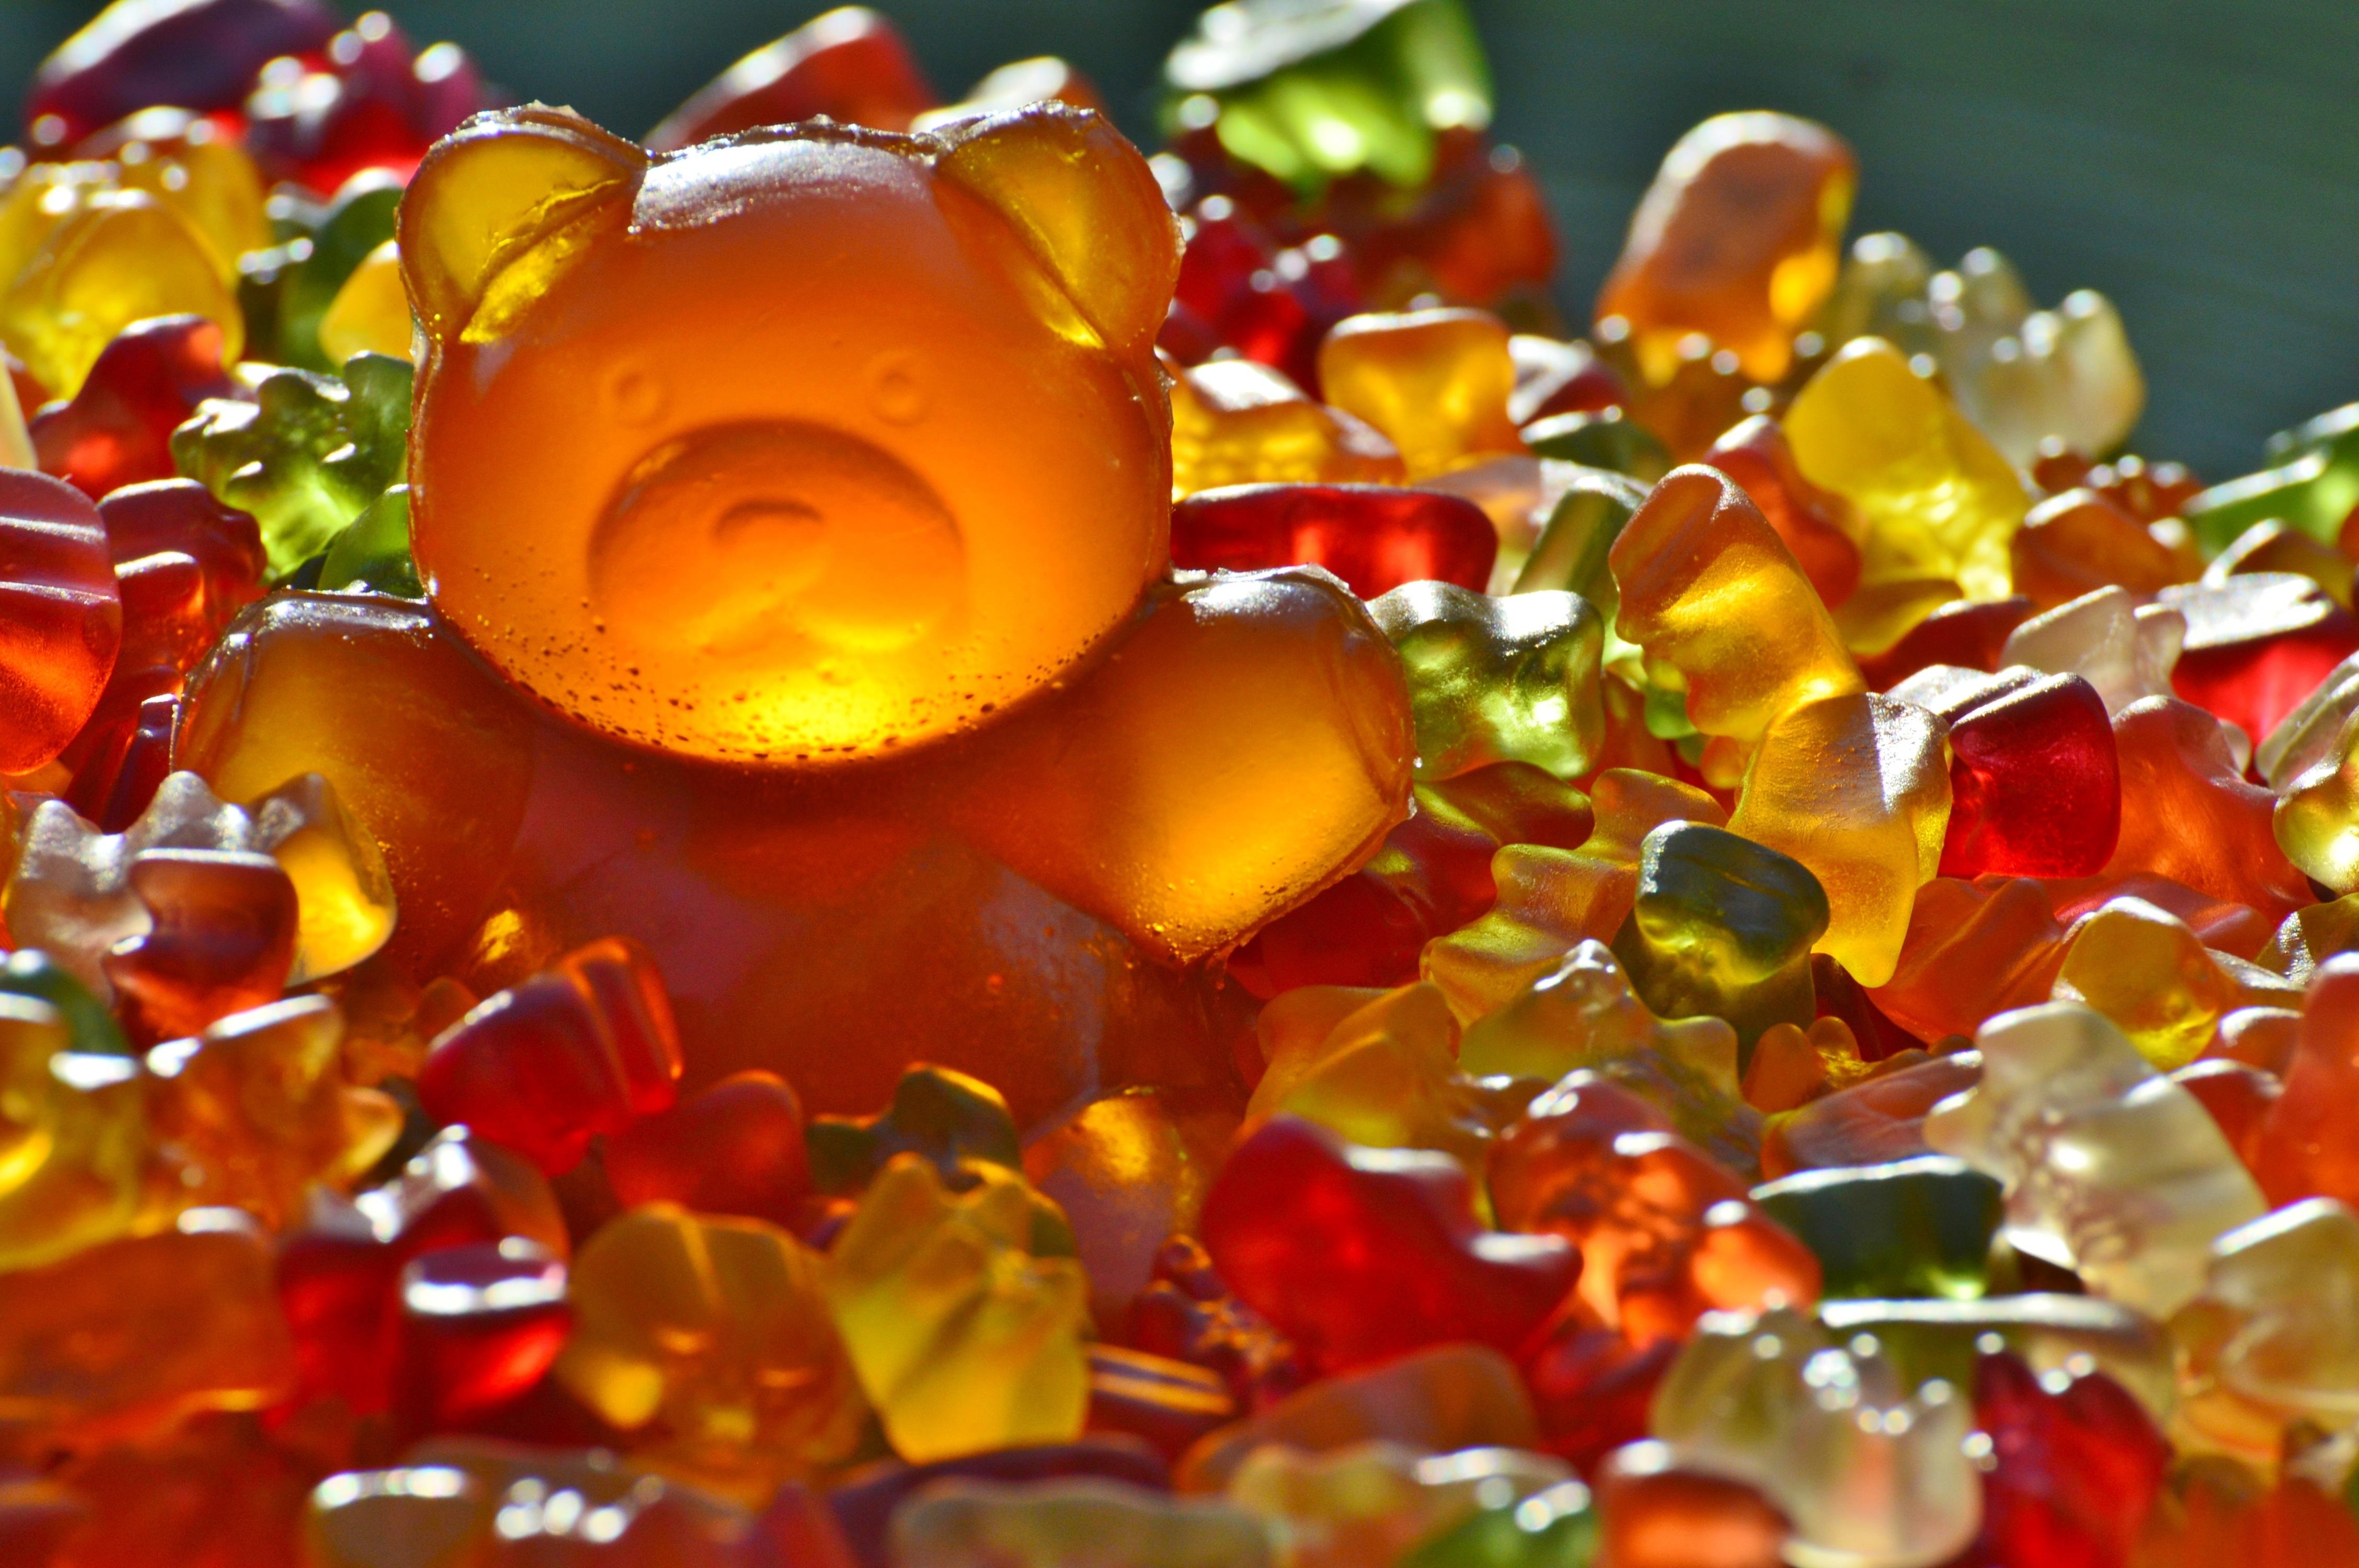 Fotos gratis : planta, dulce, hoja, flor, pétalo, oso, rojo, color ...